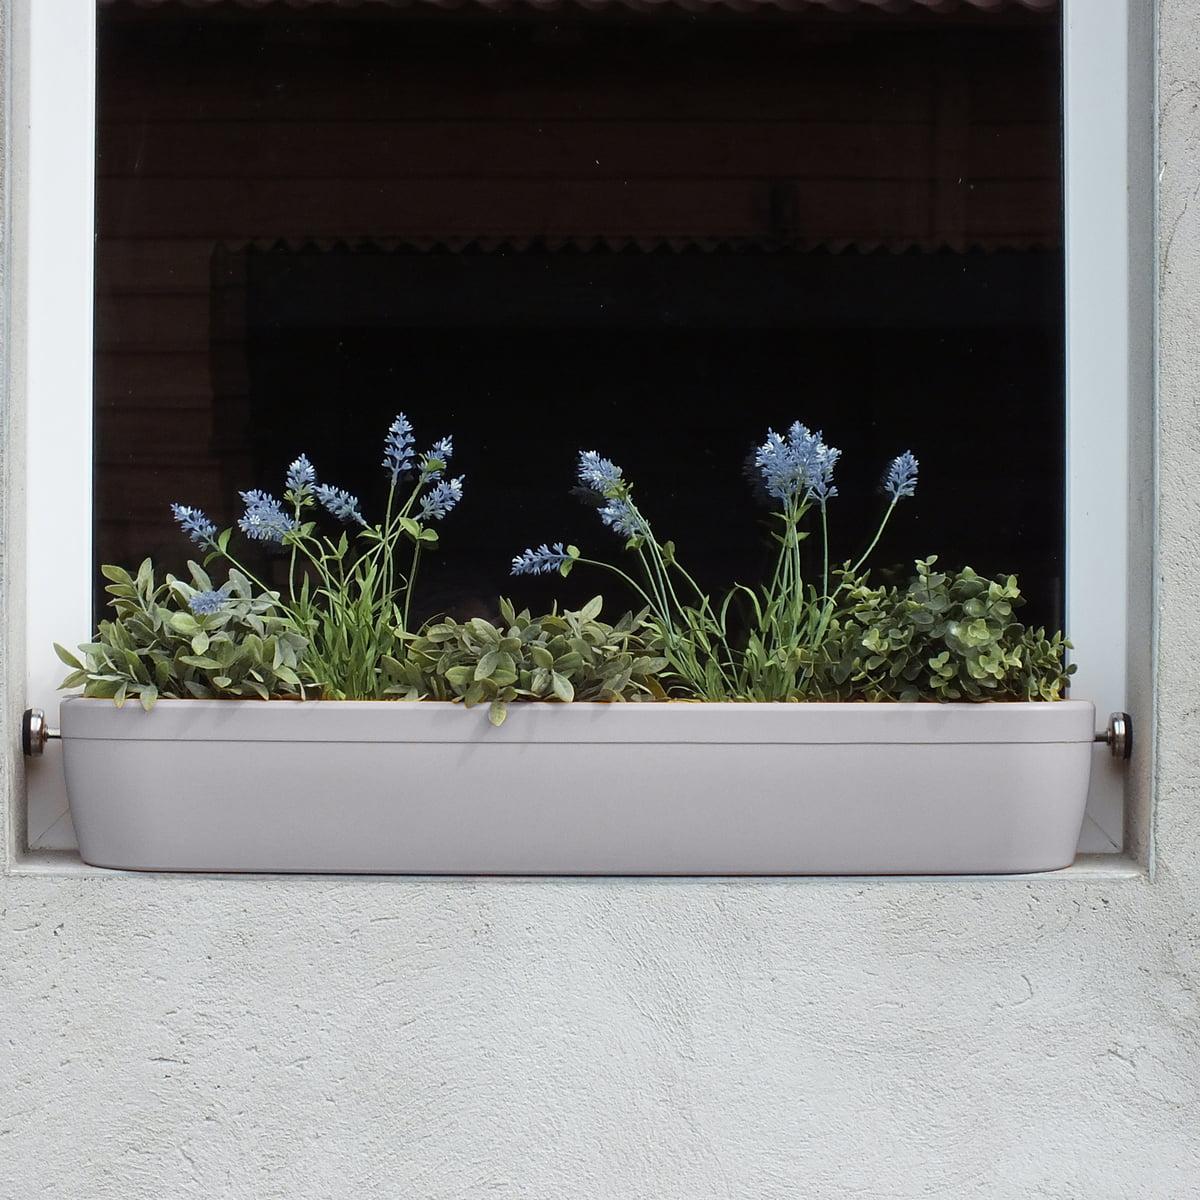 accrocher jardiniere fenetre